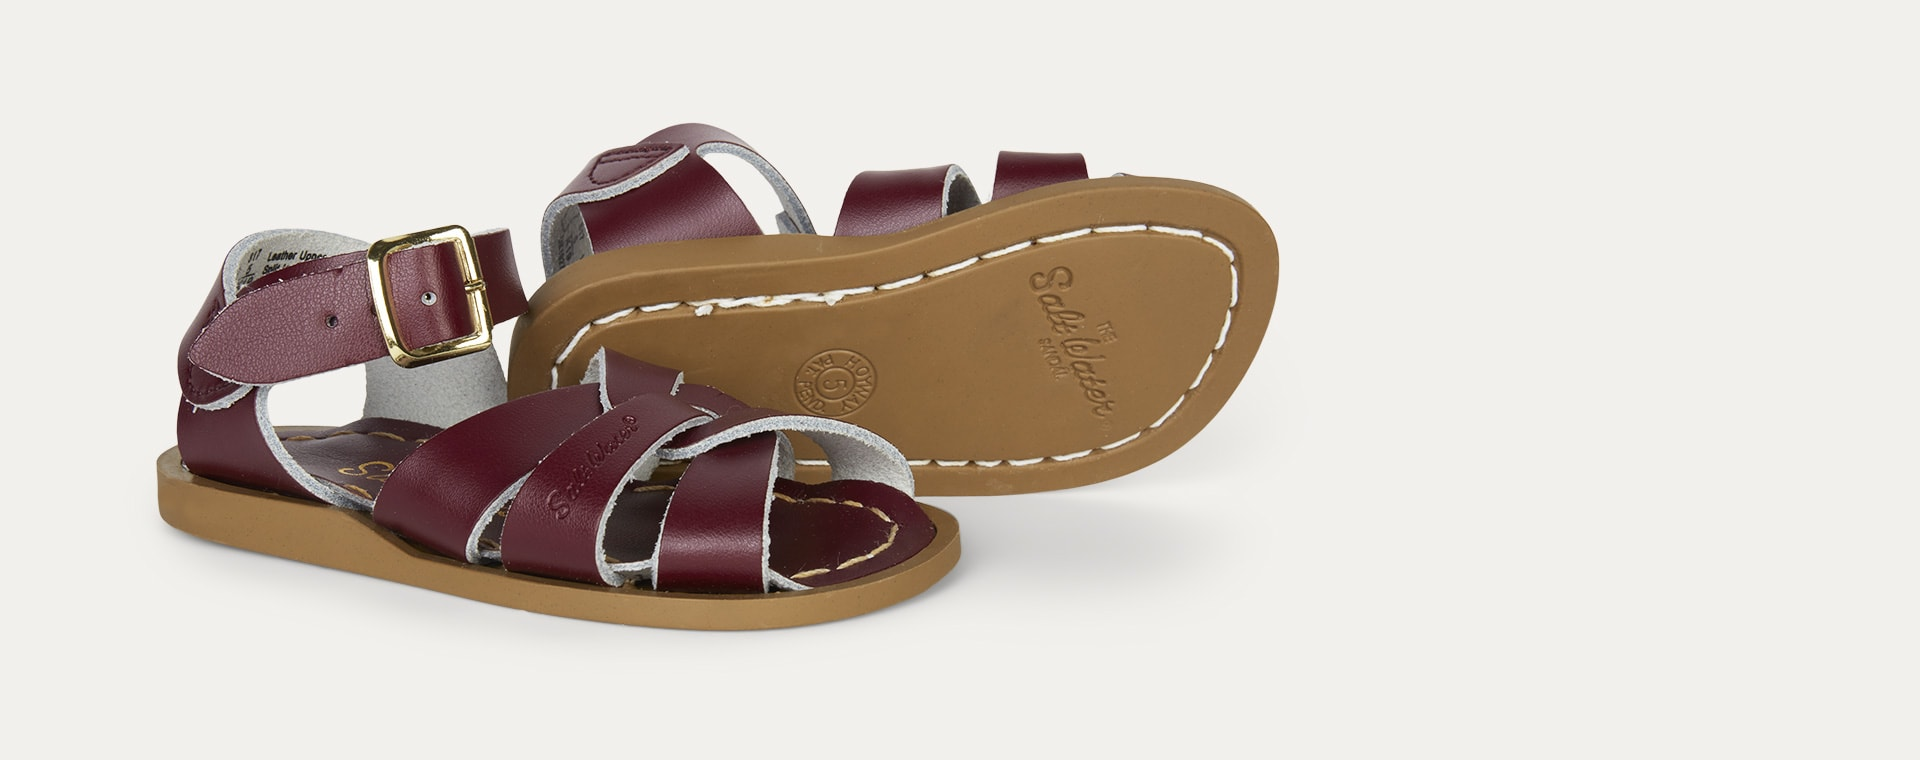 Claret Salt-Water Sandals The Original Salt Water Sandal